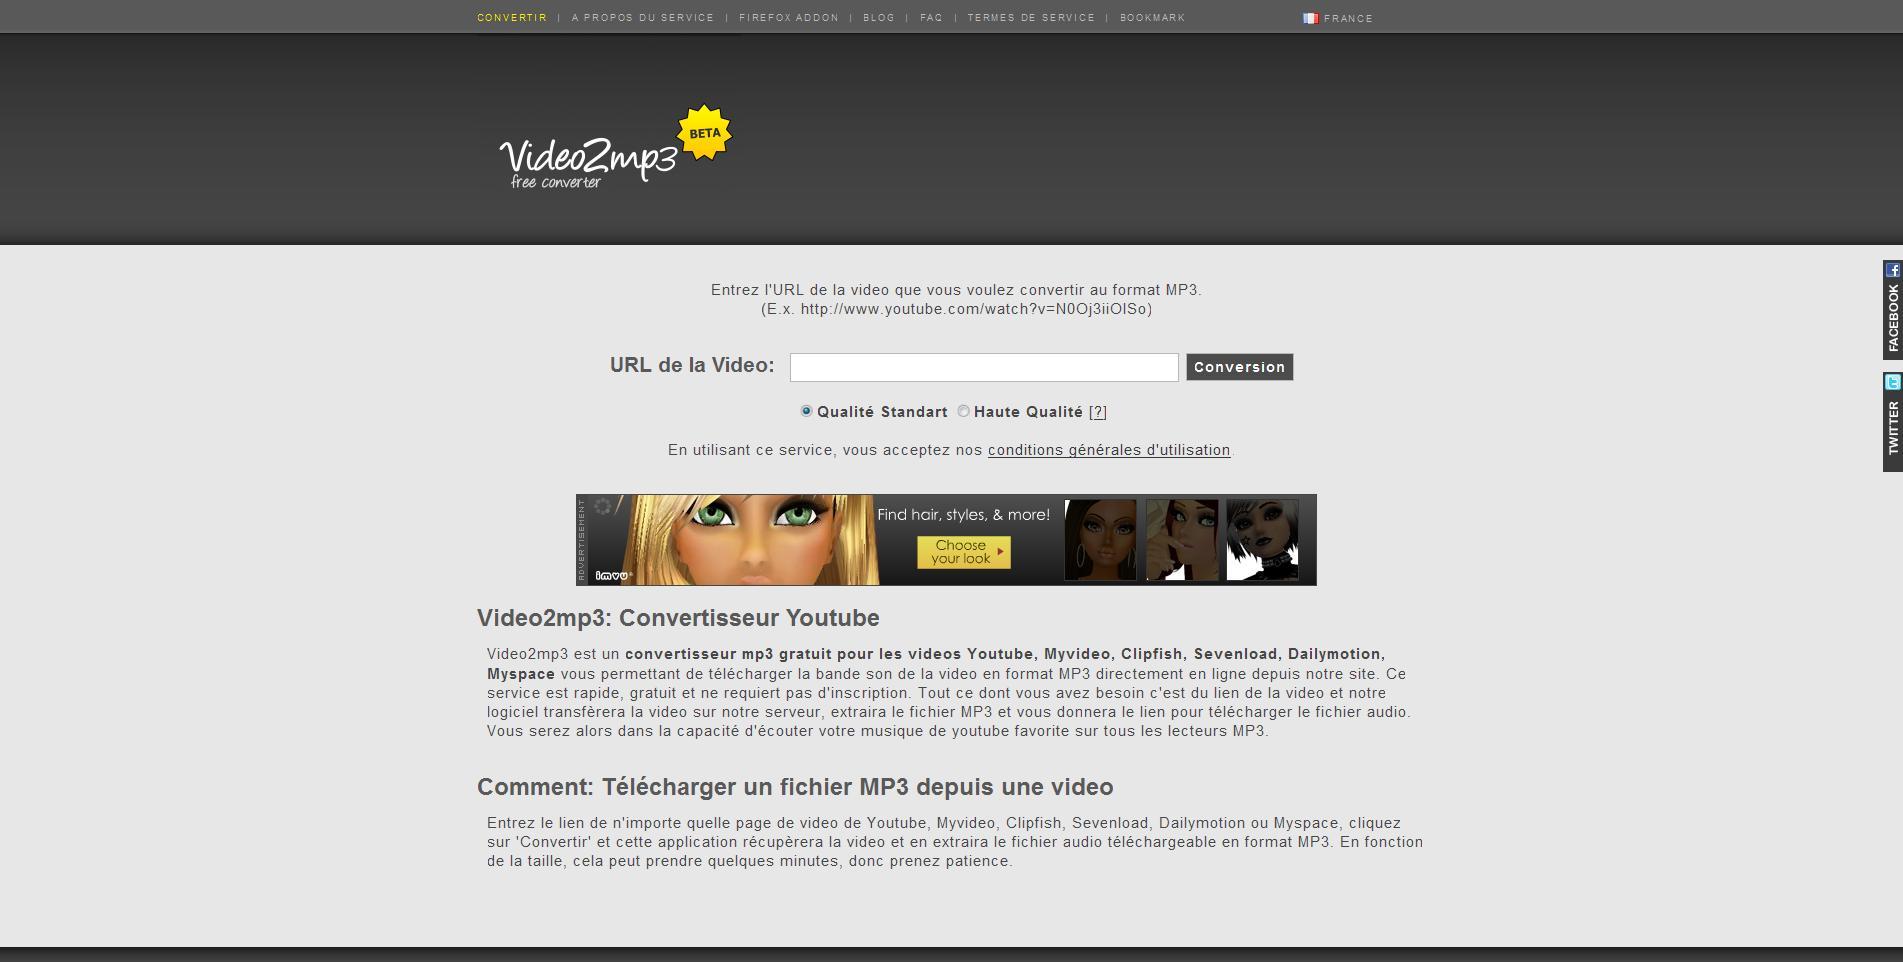 Convertir image jpg en document word en ligne gratuit